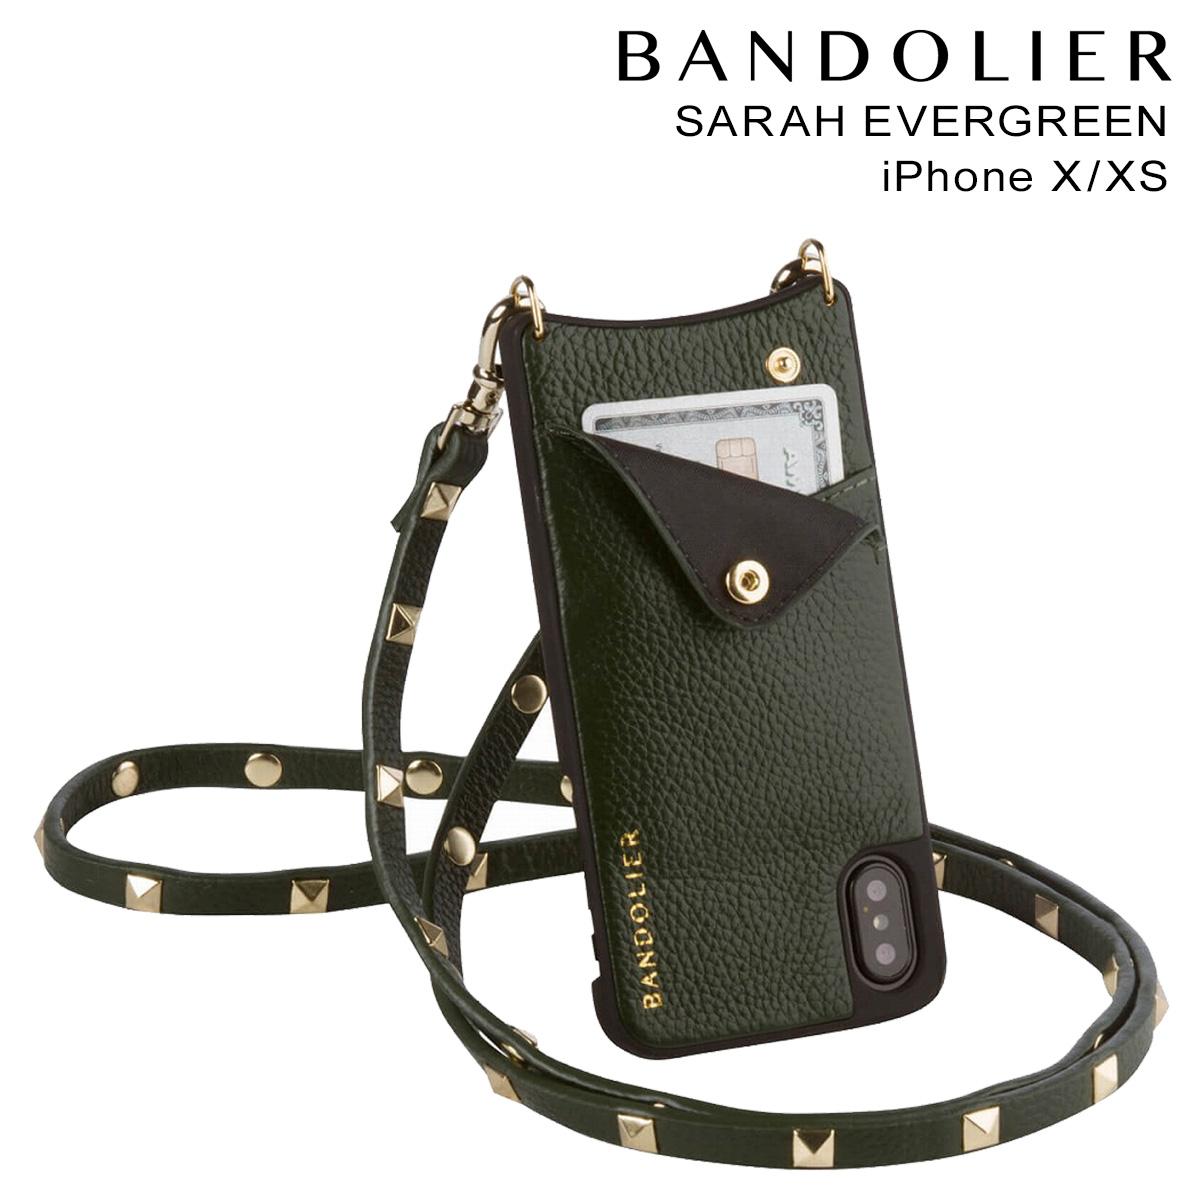 BANDOLIER バンドリヤー iPhoneXS X ケース スマホ アイフォン SARAH EVERGREEN レザー メンズ レディース [10/25 新入荷]